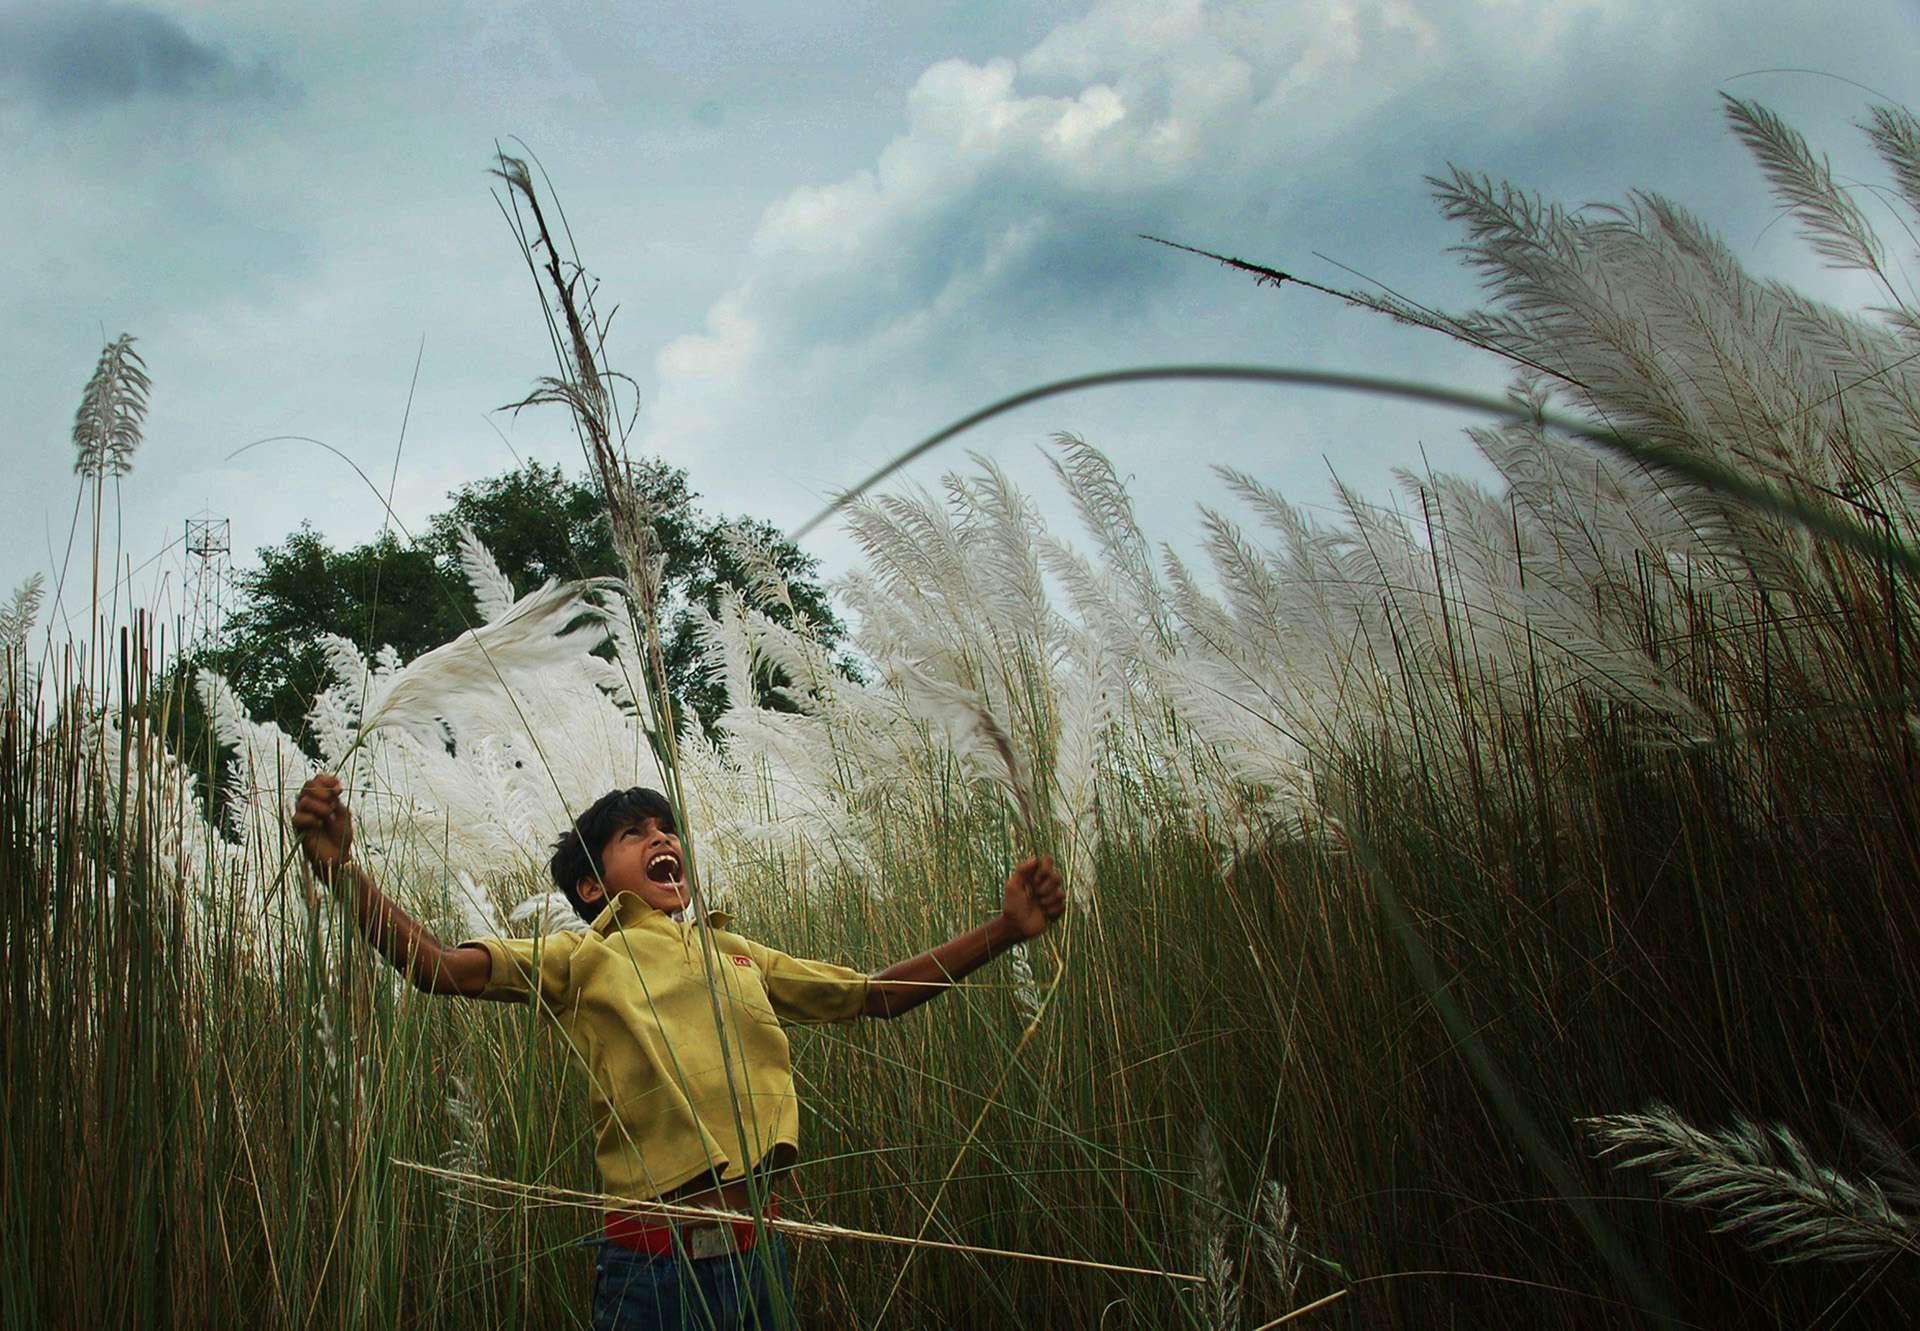 Photograph by Anirban Ghosh